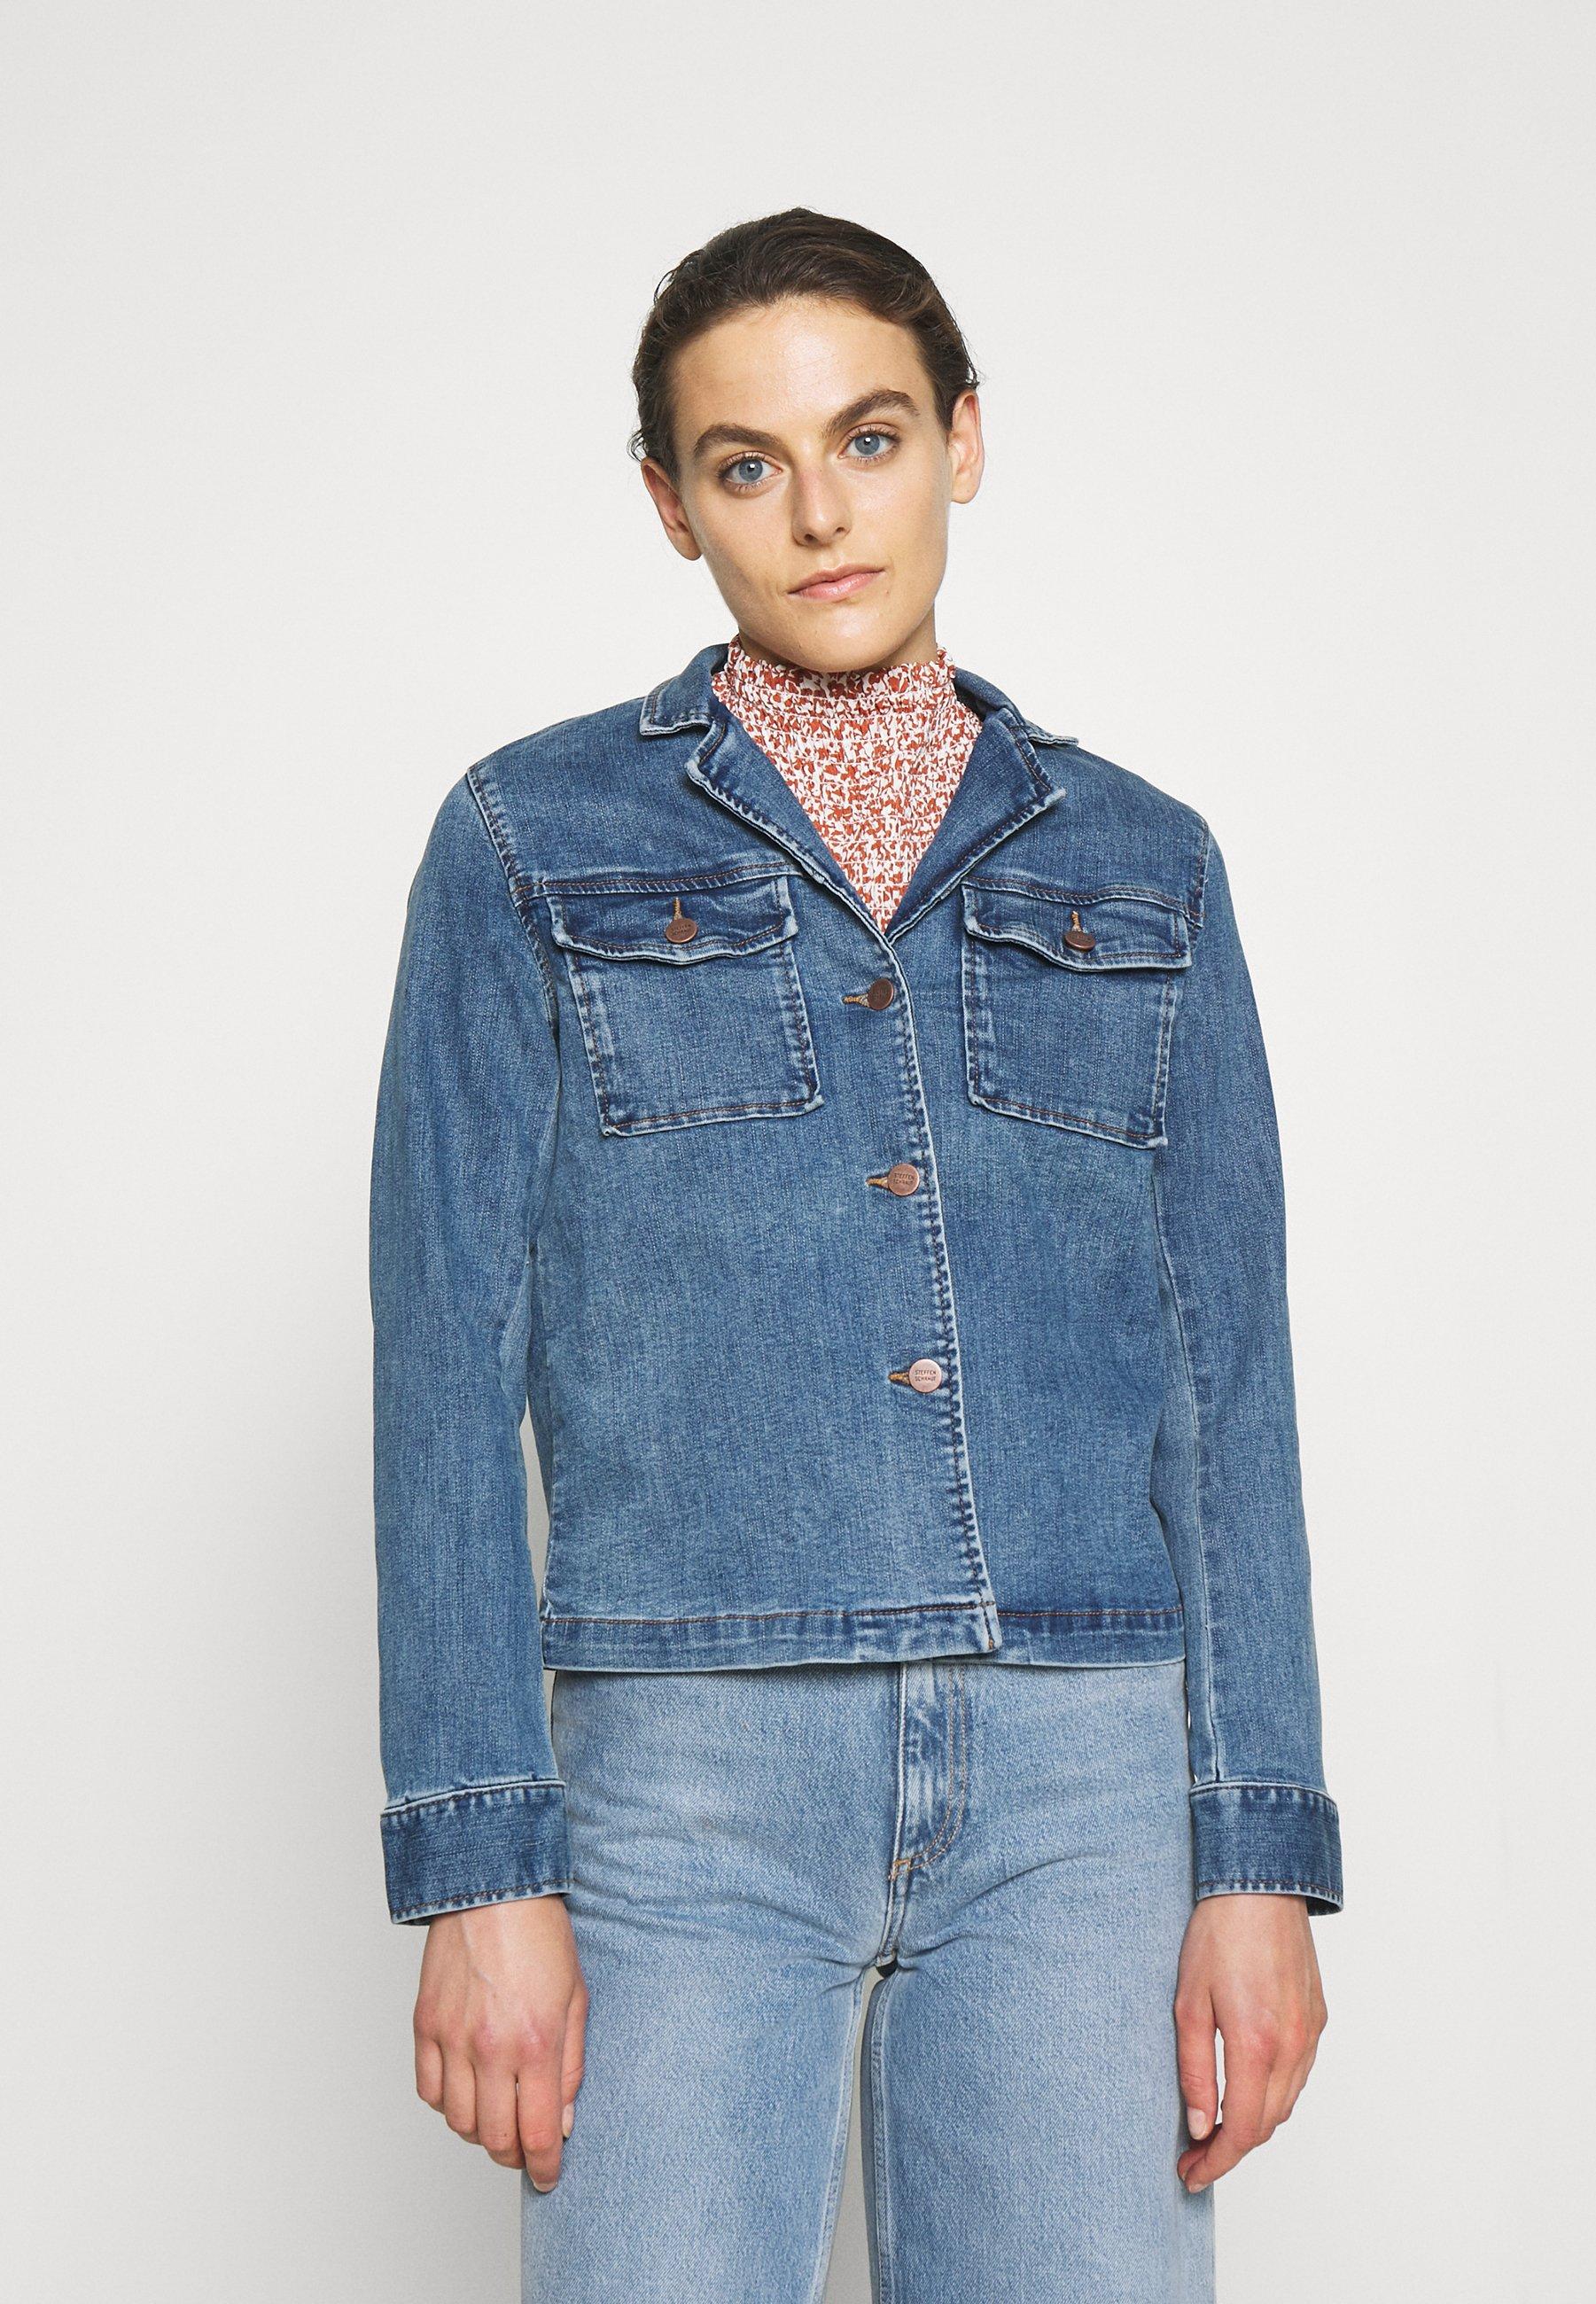 Femme CAROLYNE RANCHERO JACKET - Veste en jean